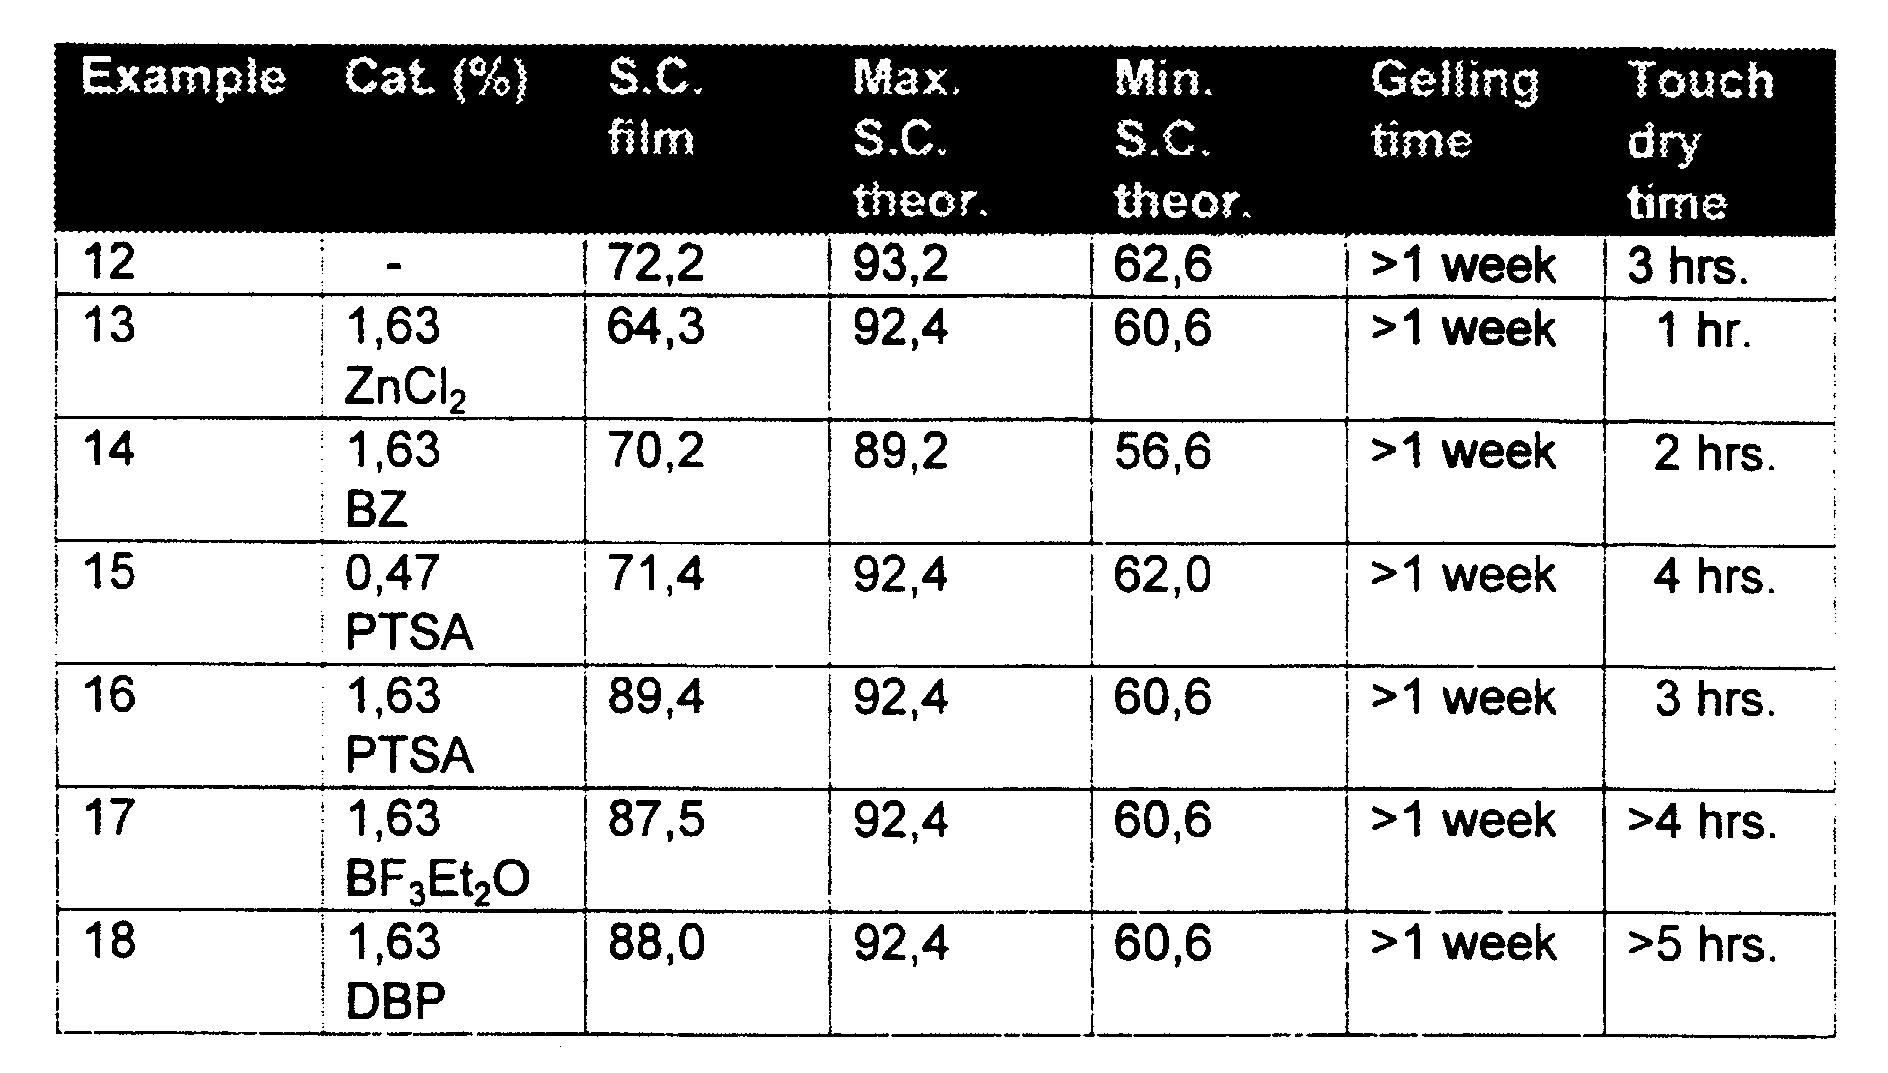 EP0882106B1 - Coating composition comprising a bicyclo- or spiro